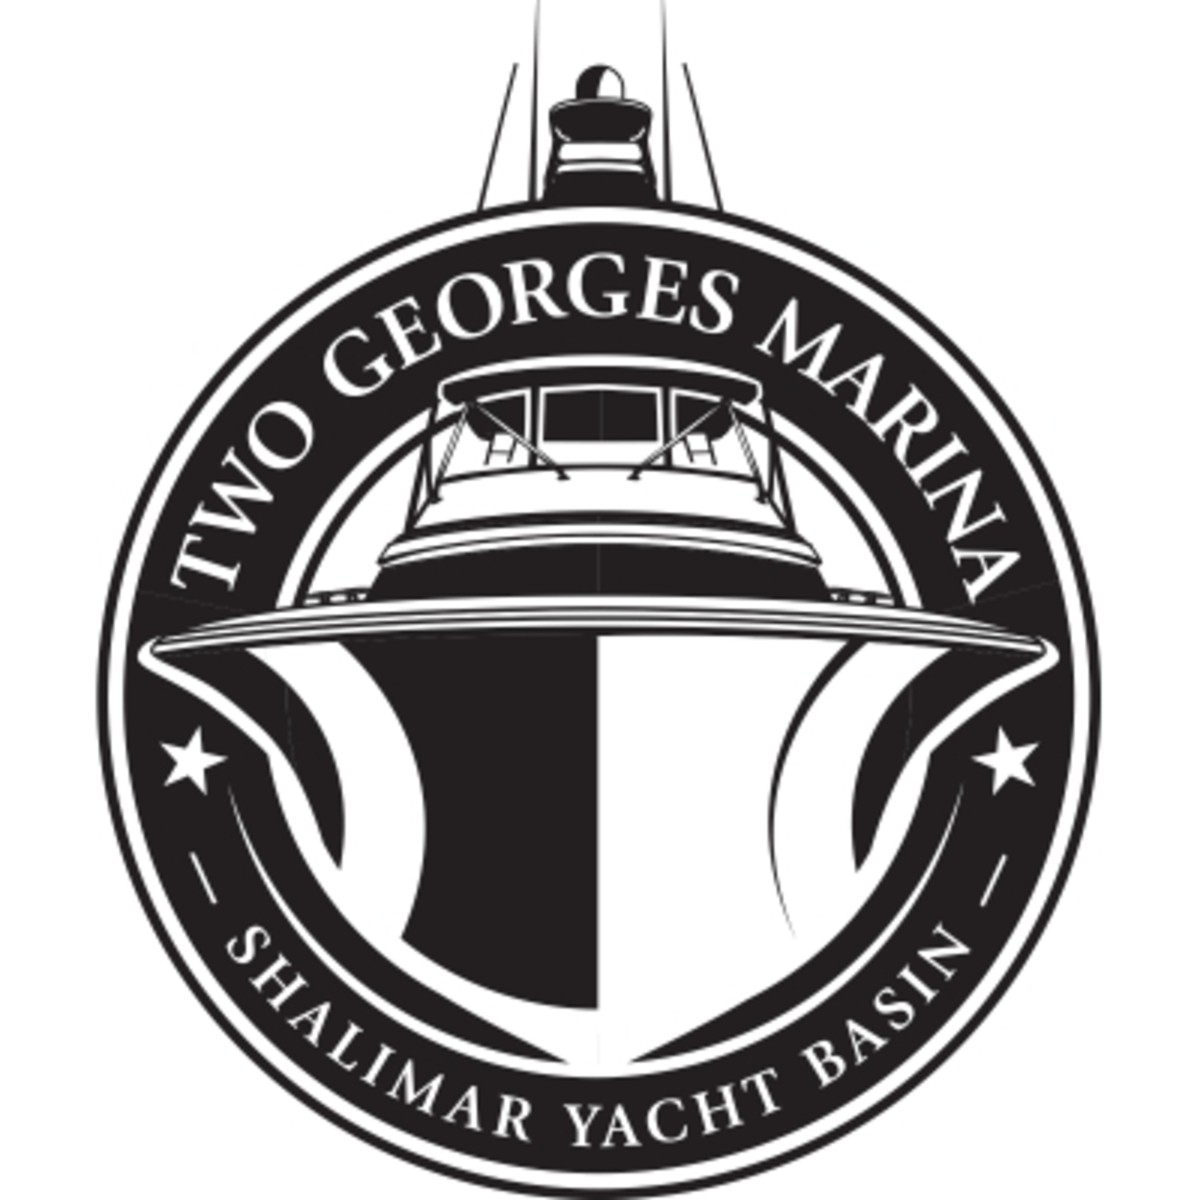 2 Georges Marina